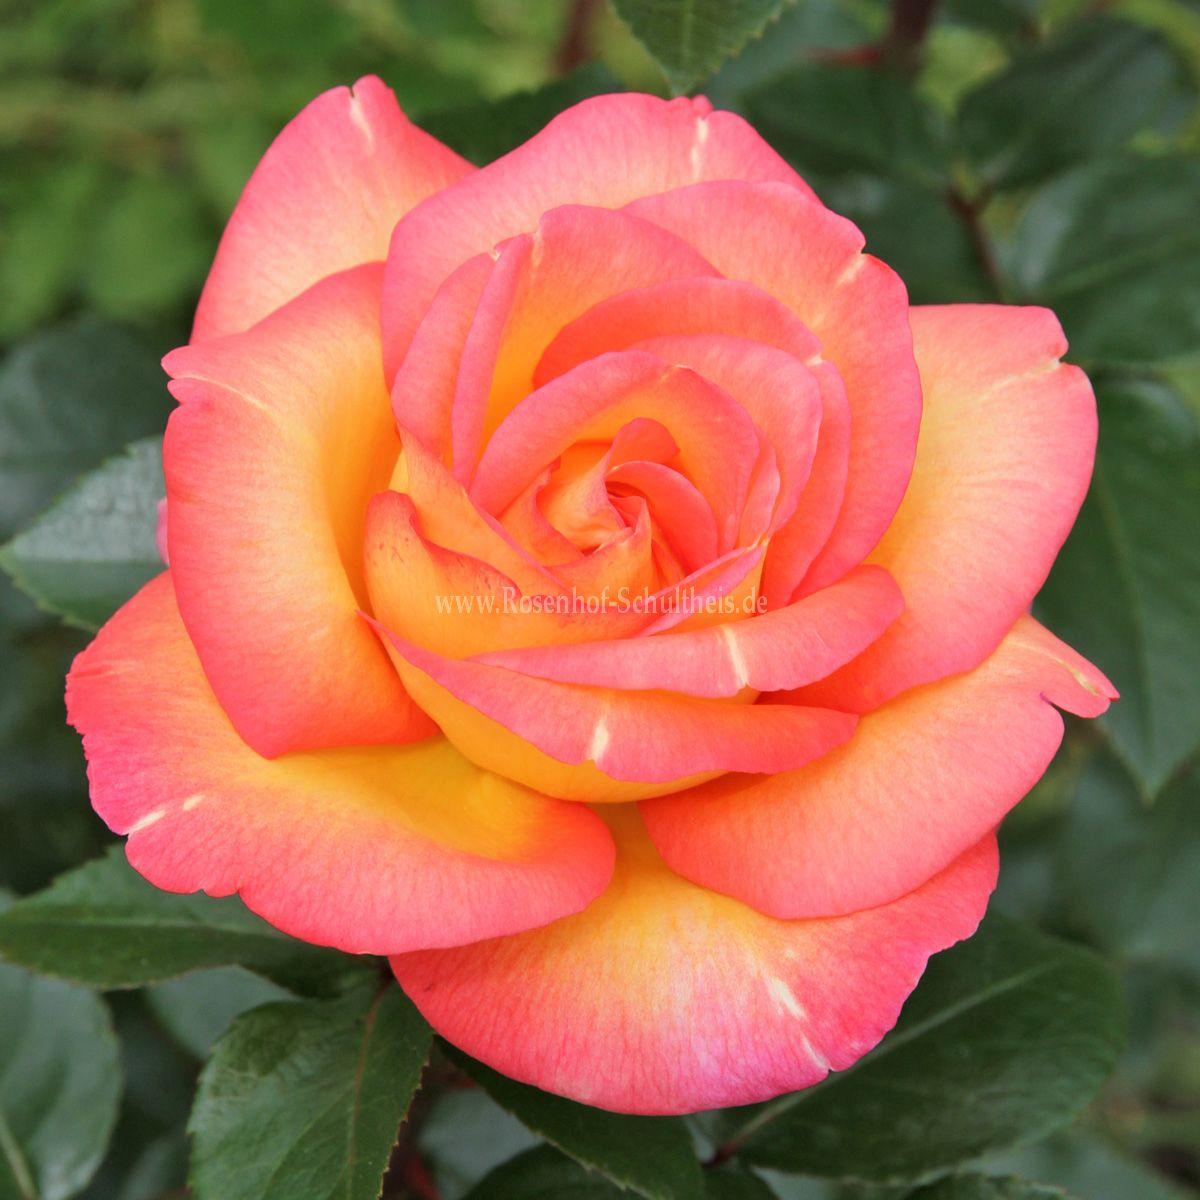 roberto alagna rosen online kaufen im rosenhof schultheis rosen online kaufen im rosenhof. Black Bedroom Furniture Sets. Home Design Ideas